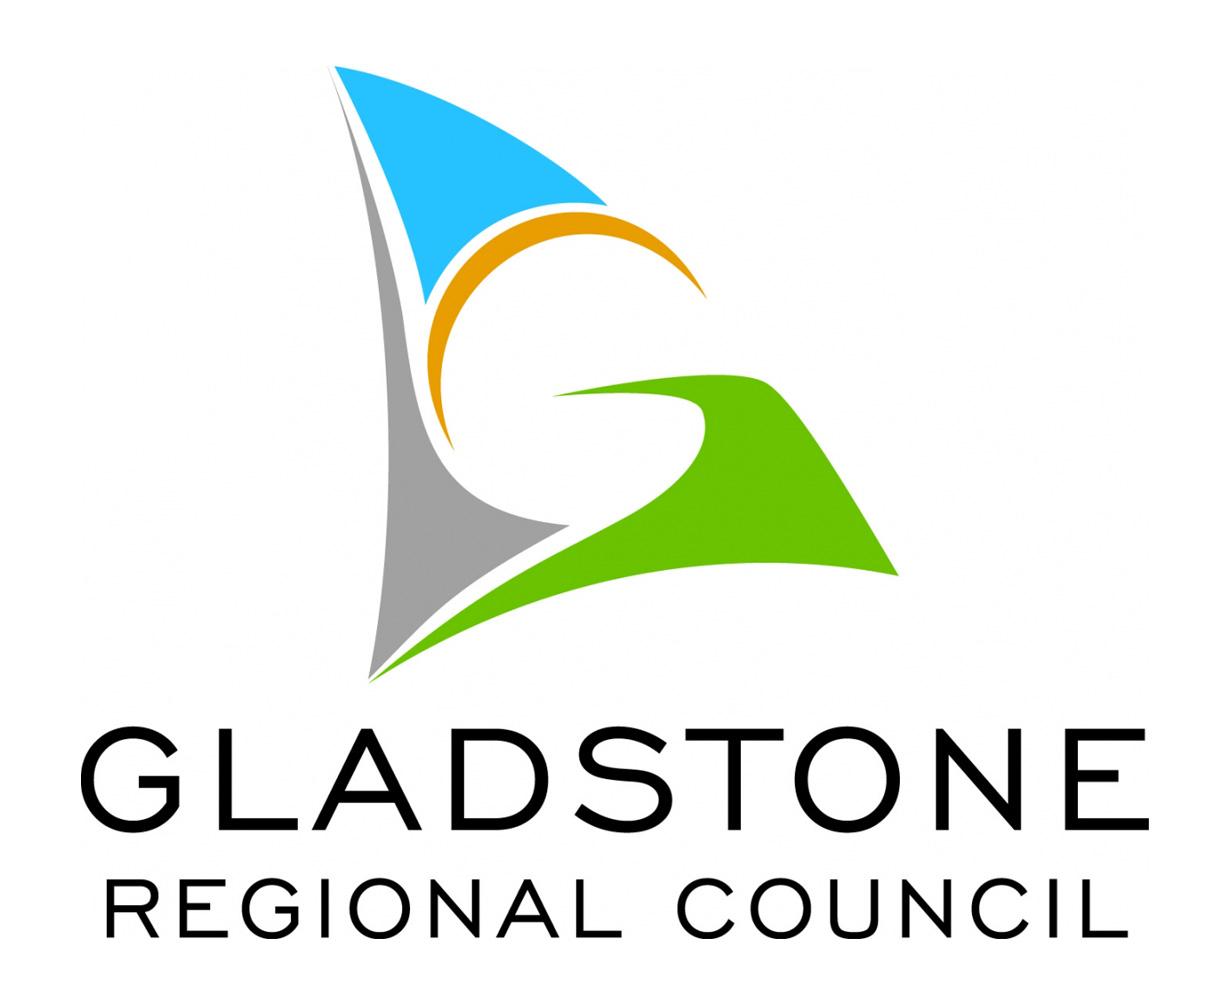 Gladstone Regional Council